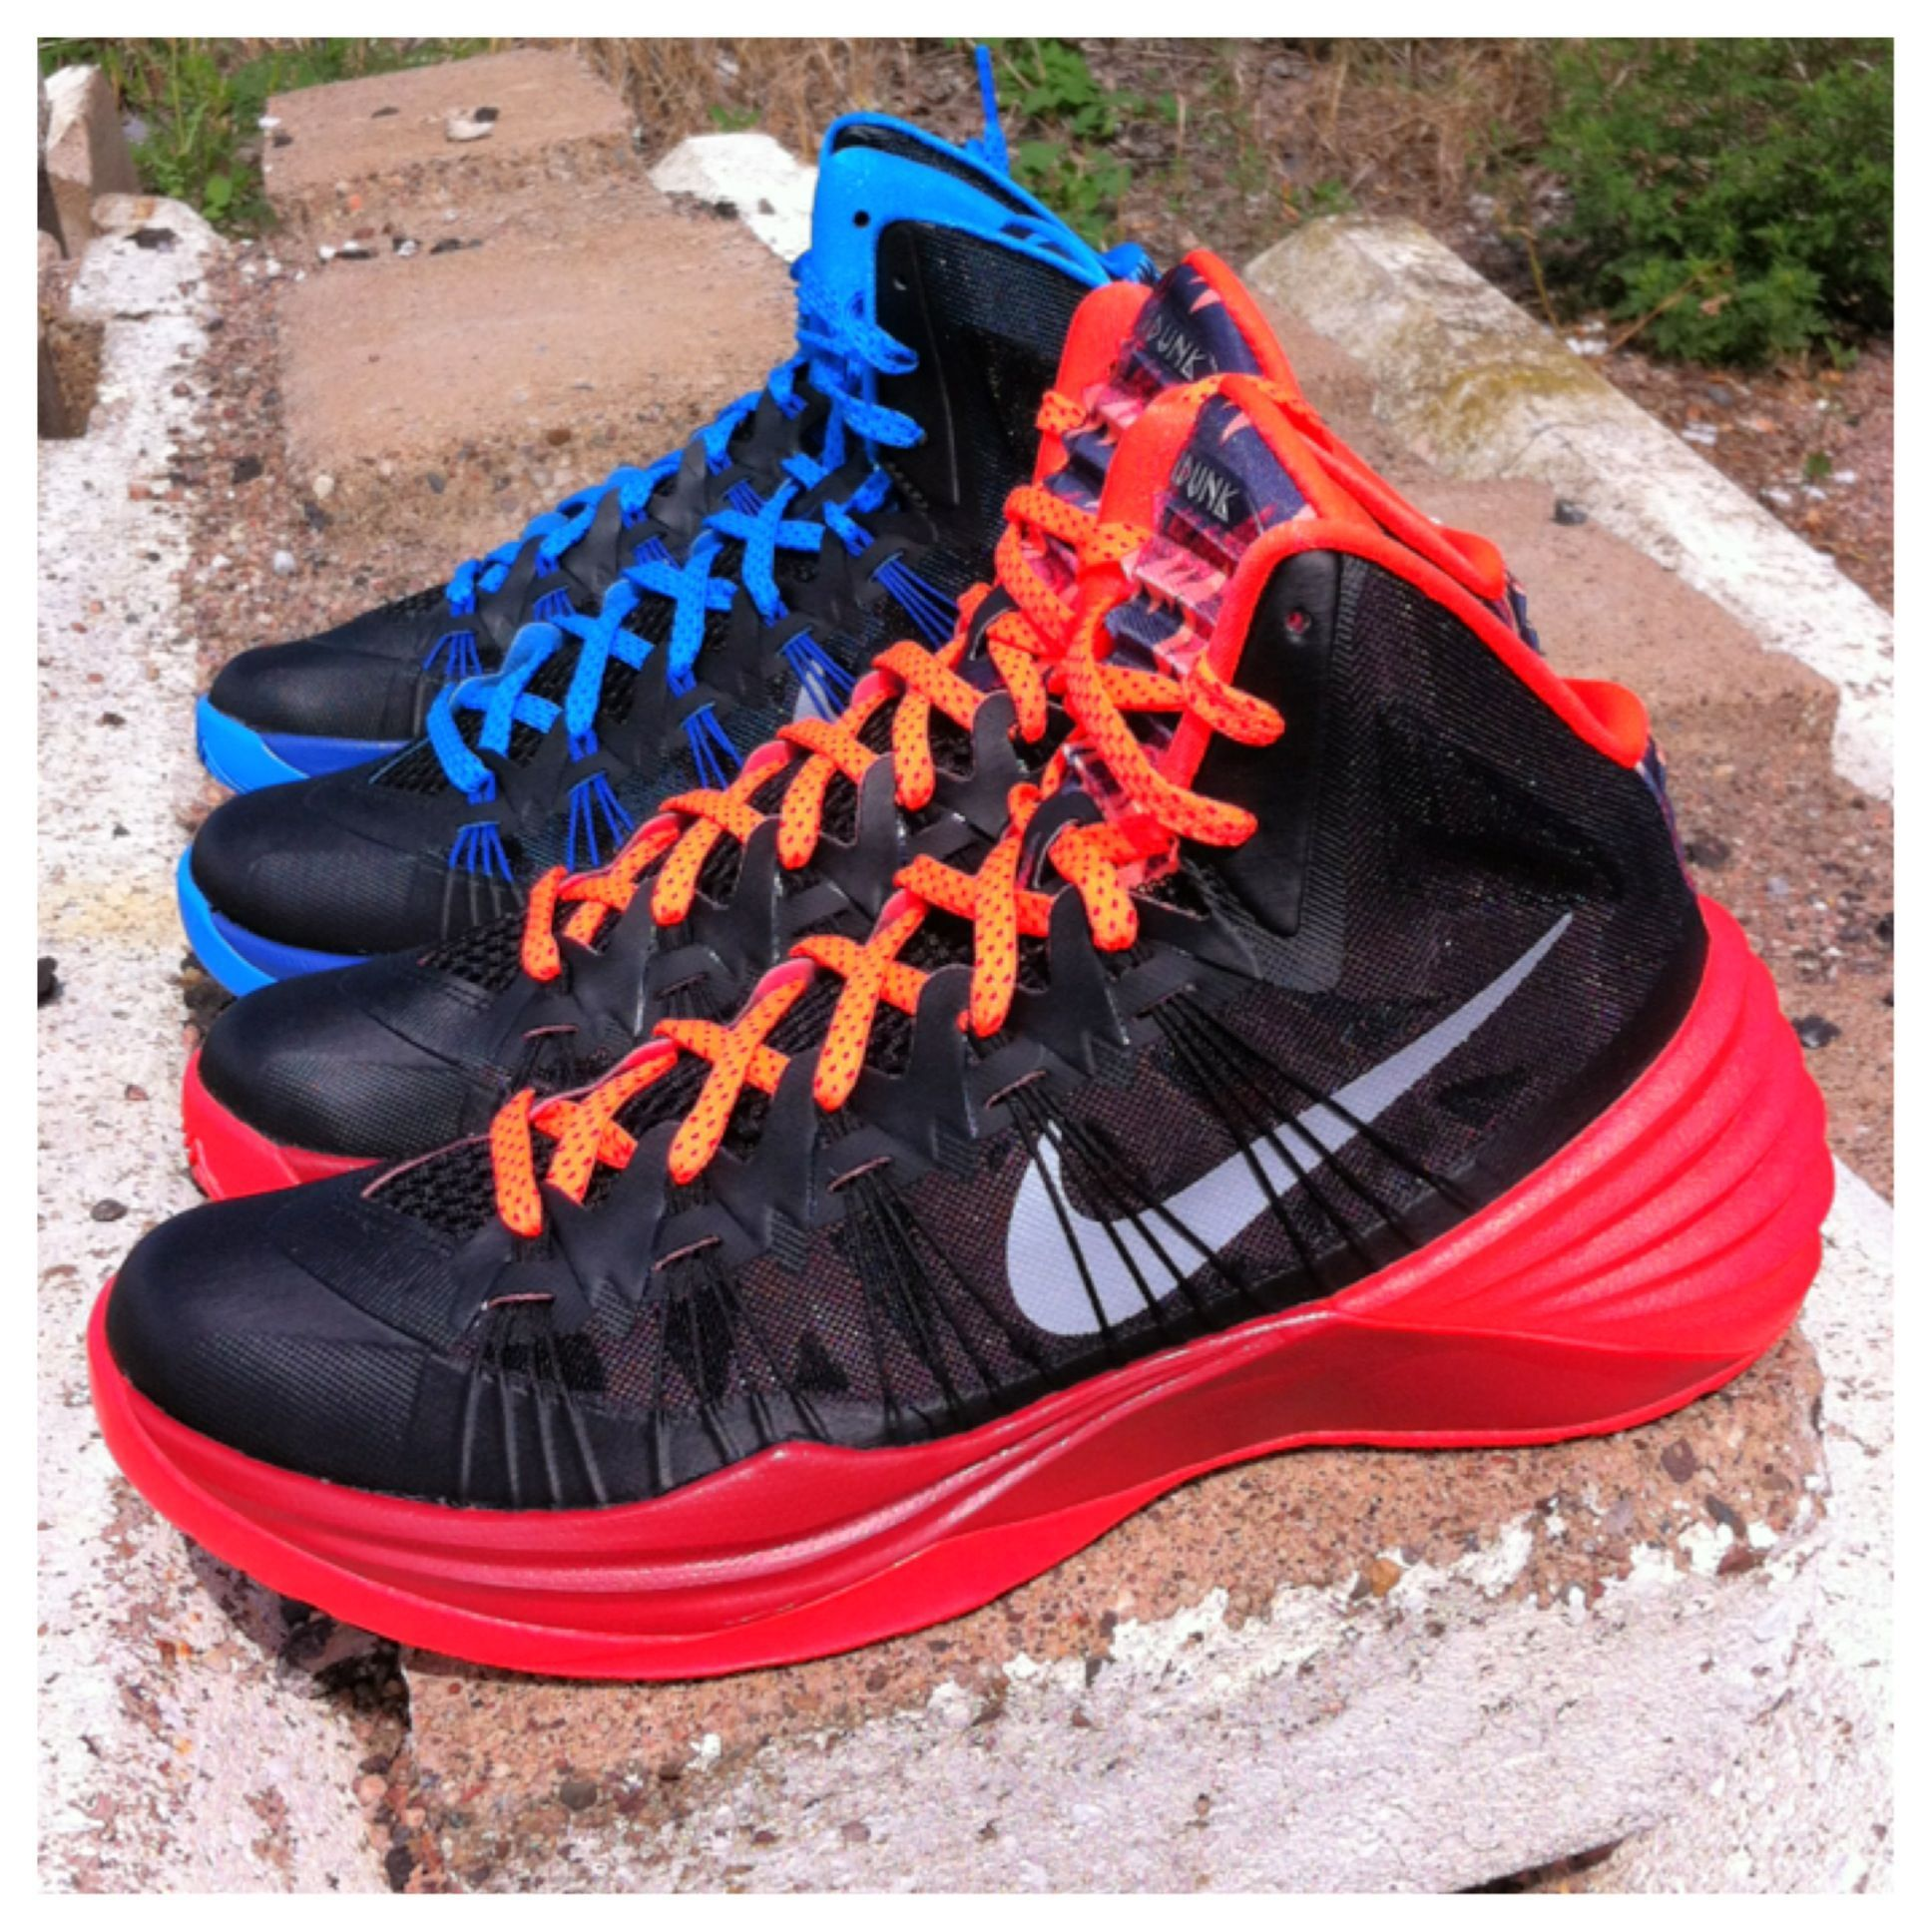 quality design 99da3 b3f0f Nike Hyperdunk 2013 in even more colorways.  Eastbay